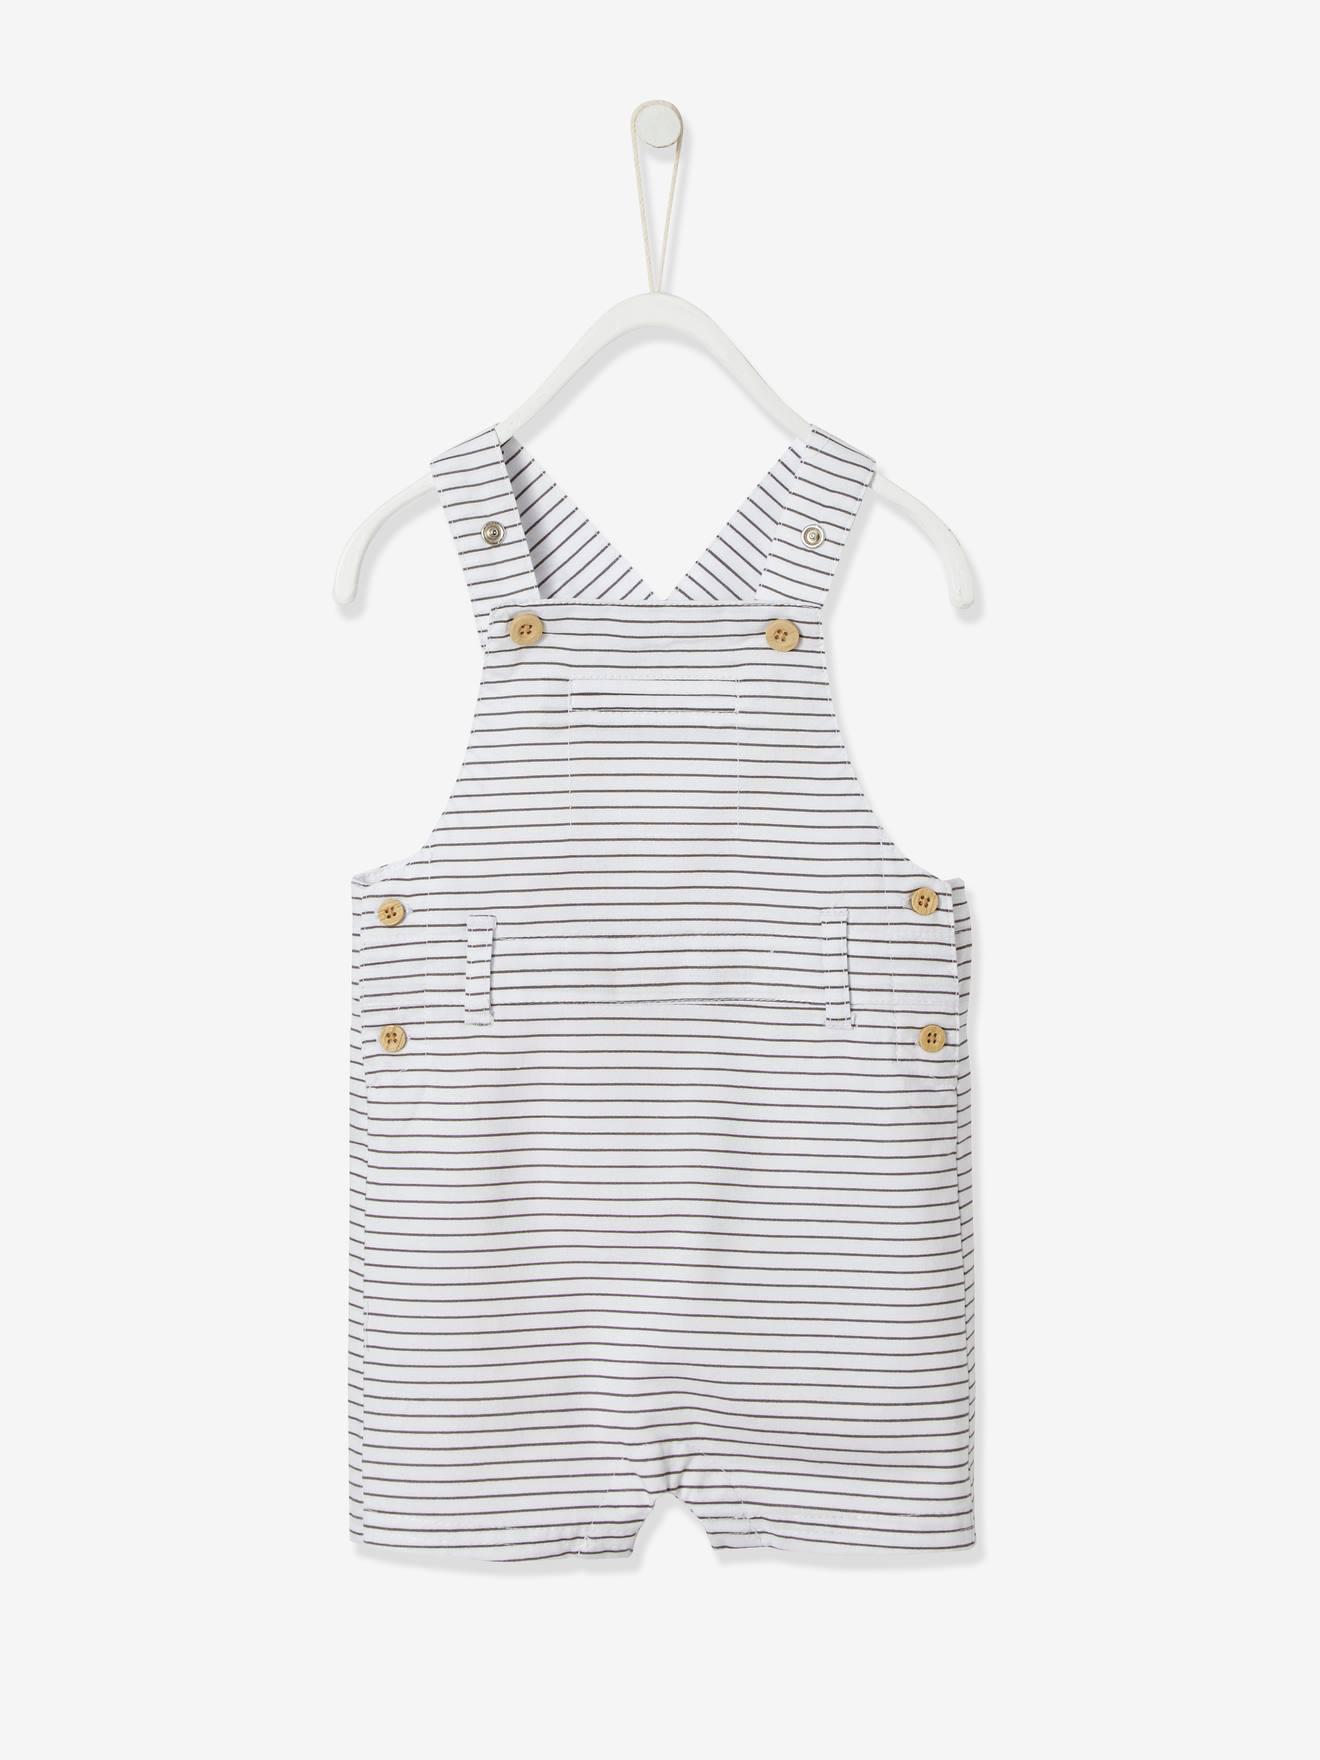 74 80 Sommer Jungen Baby Set Jeans Kurz Latzhose mit T-Shirt Gr